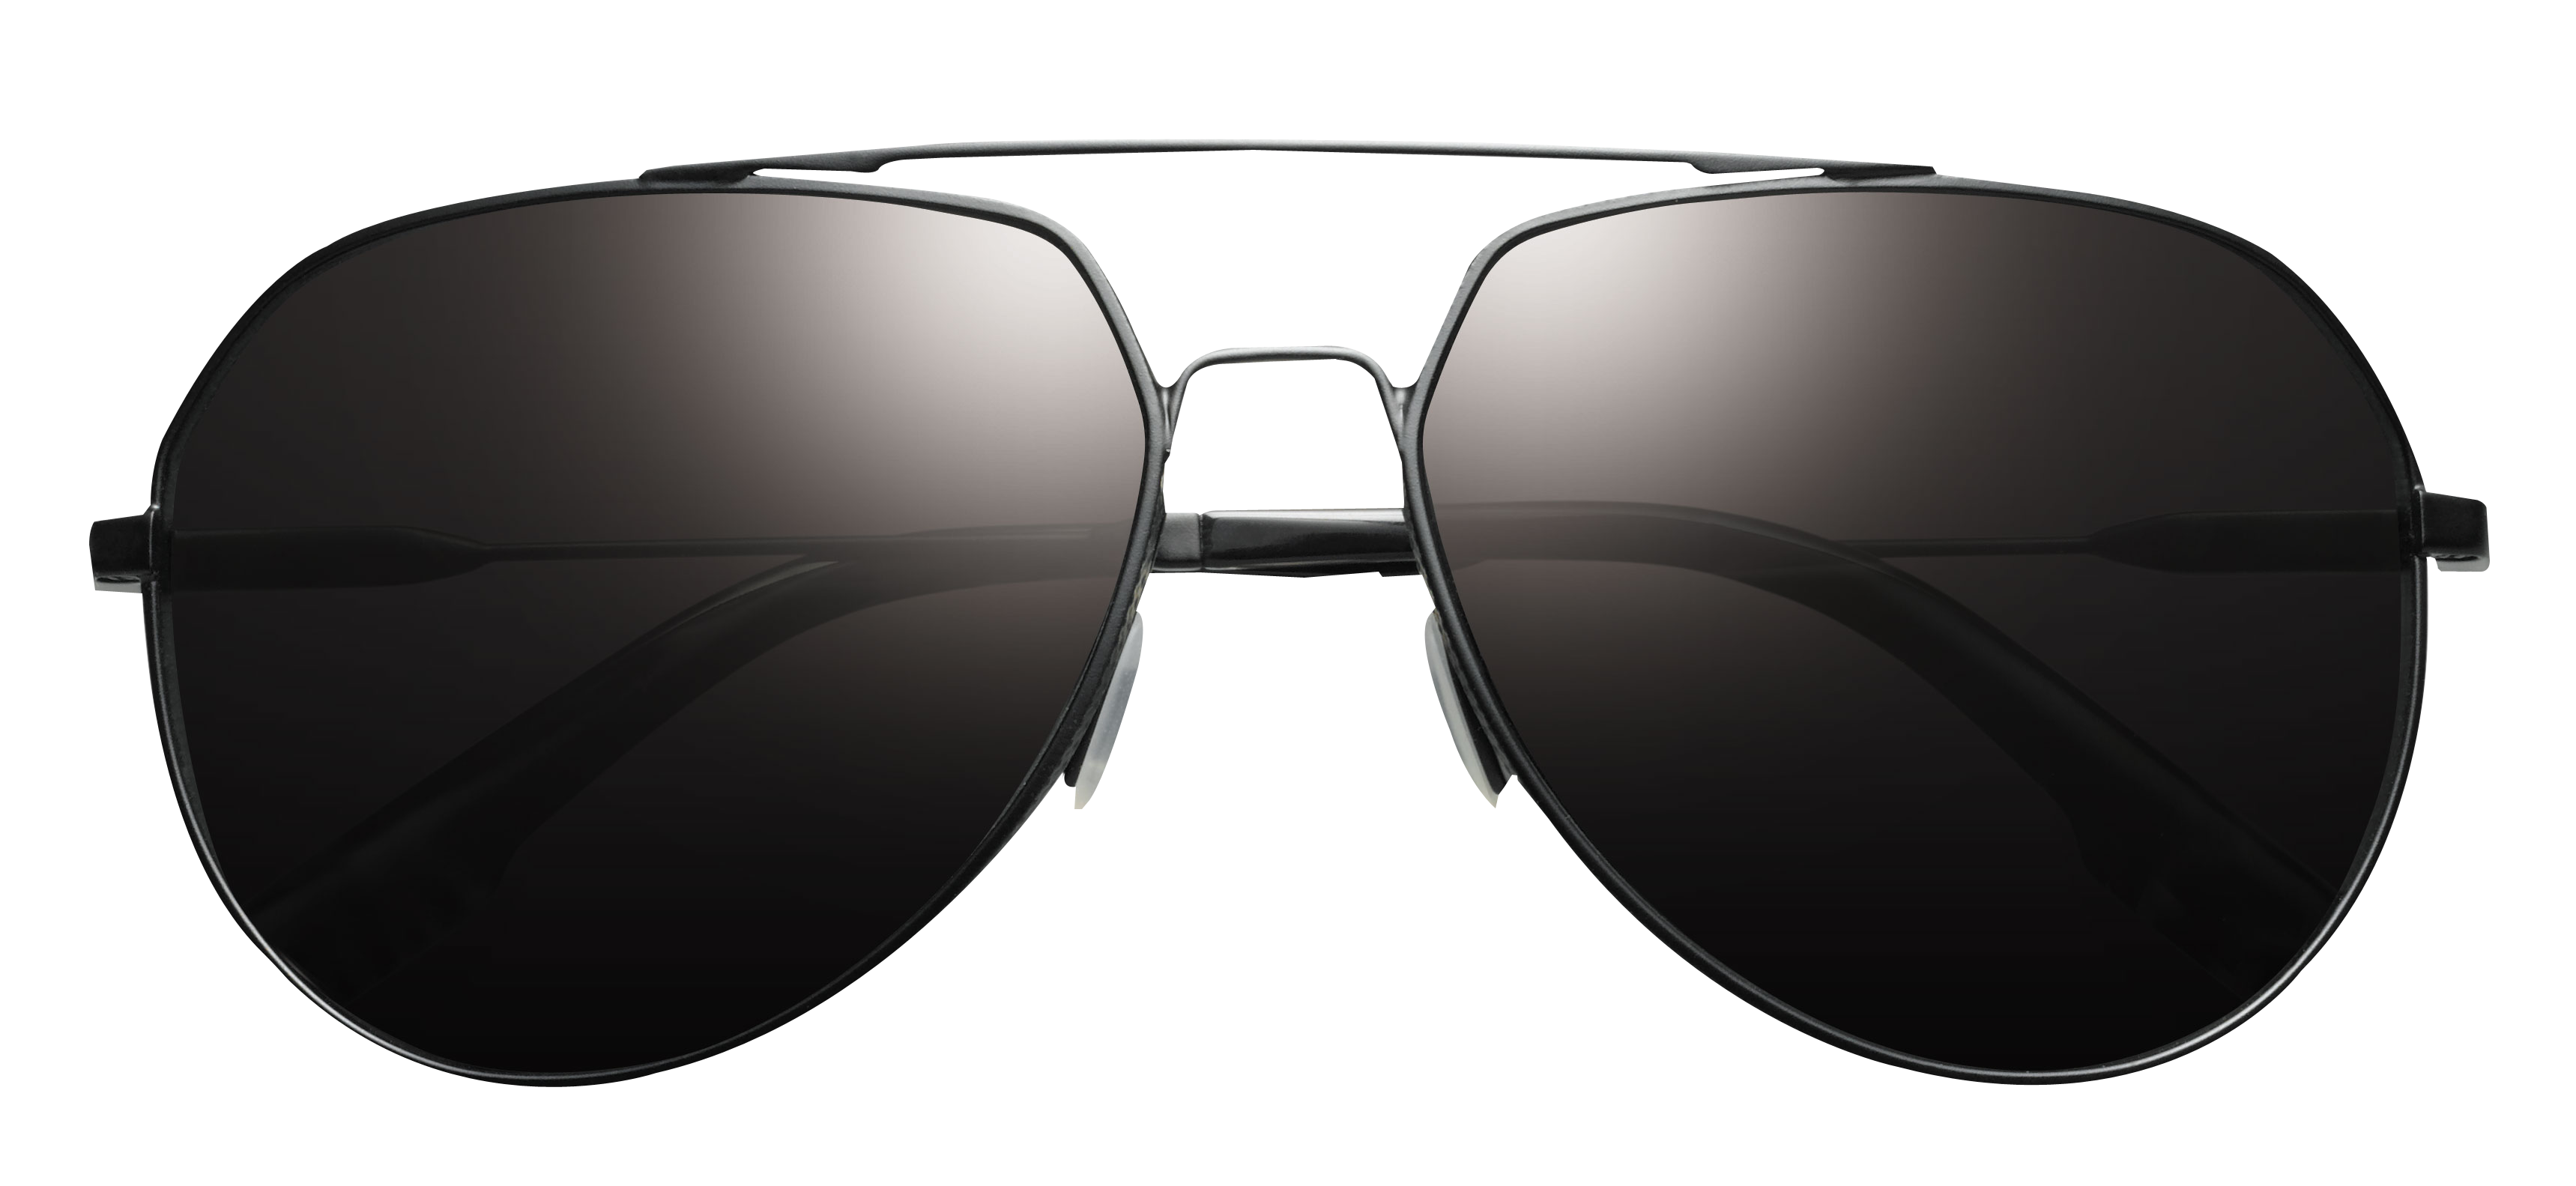 Eyeglasses clipart brown glass. Aviator sunglasses clip art